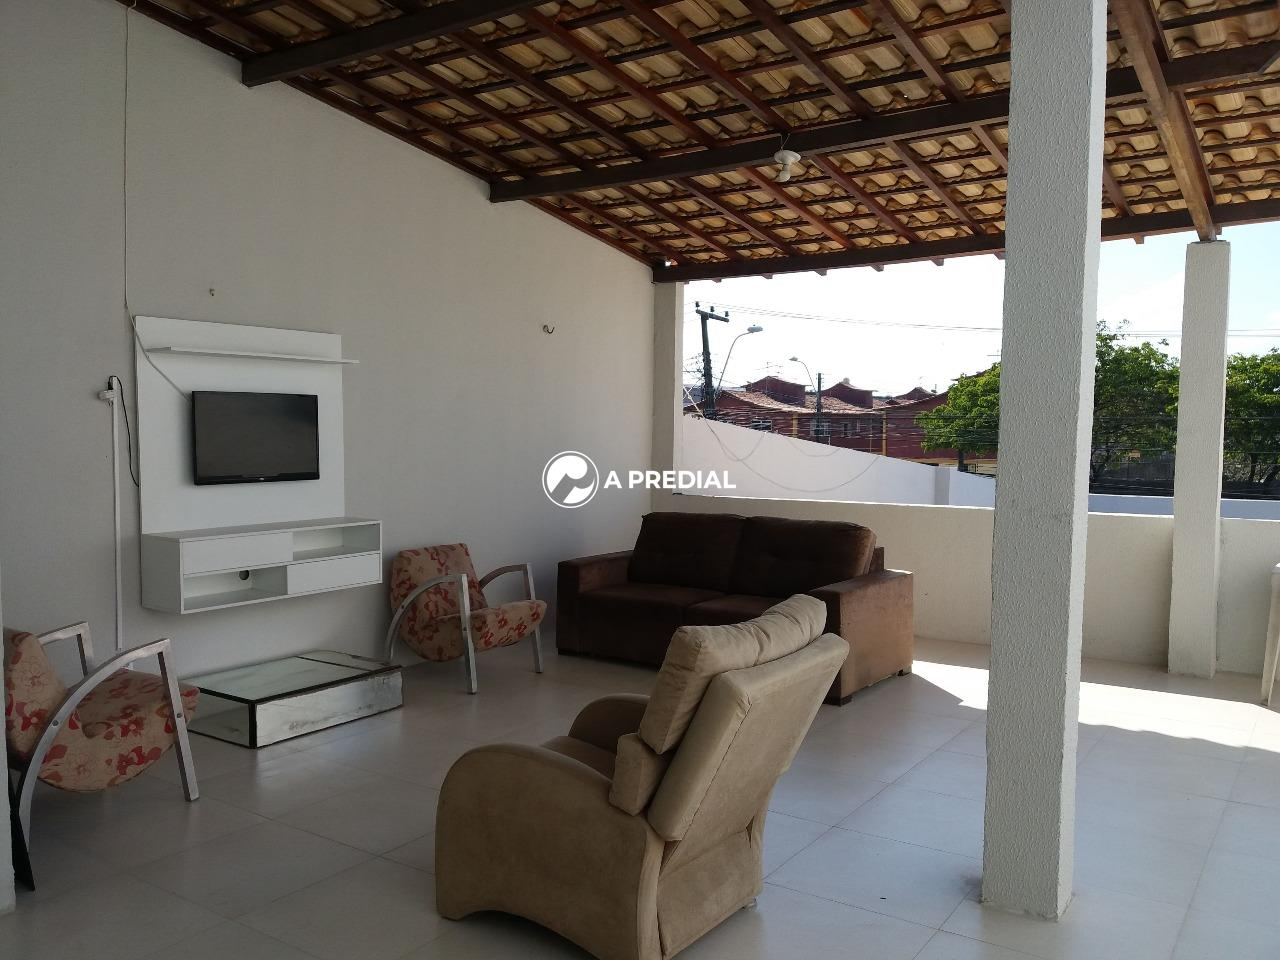 Casa para aluguel no Maraponga: varanda superior Casa Maraponga